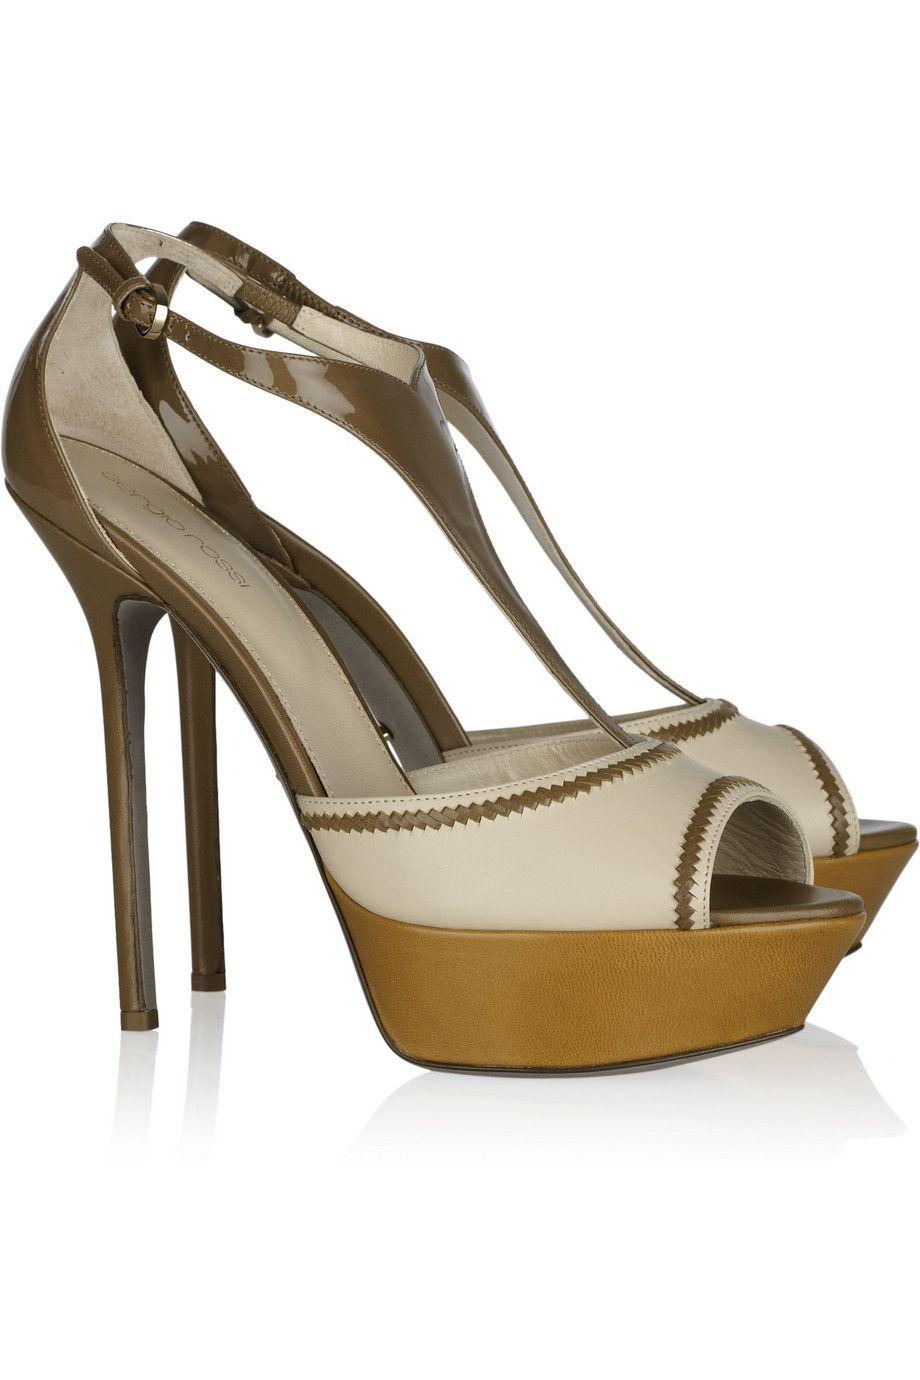 dd5162b2ae1 Sergio Rossi Color-block leather sandals